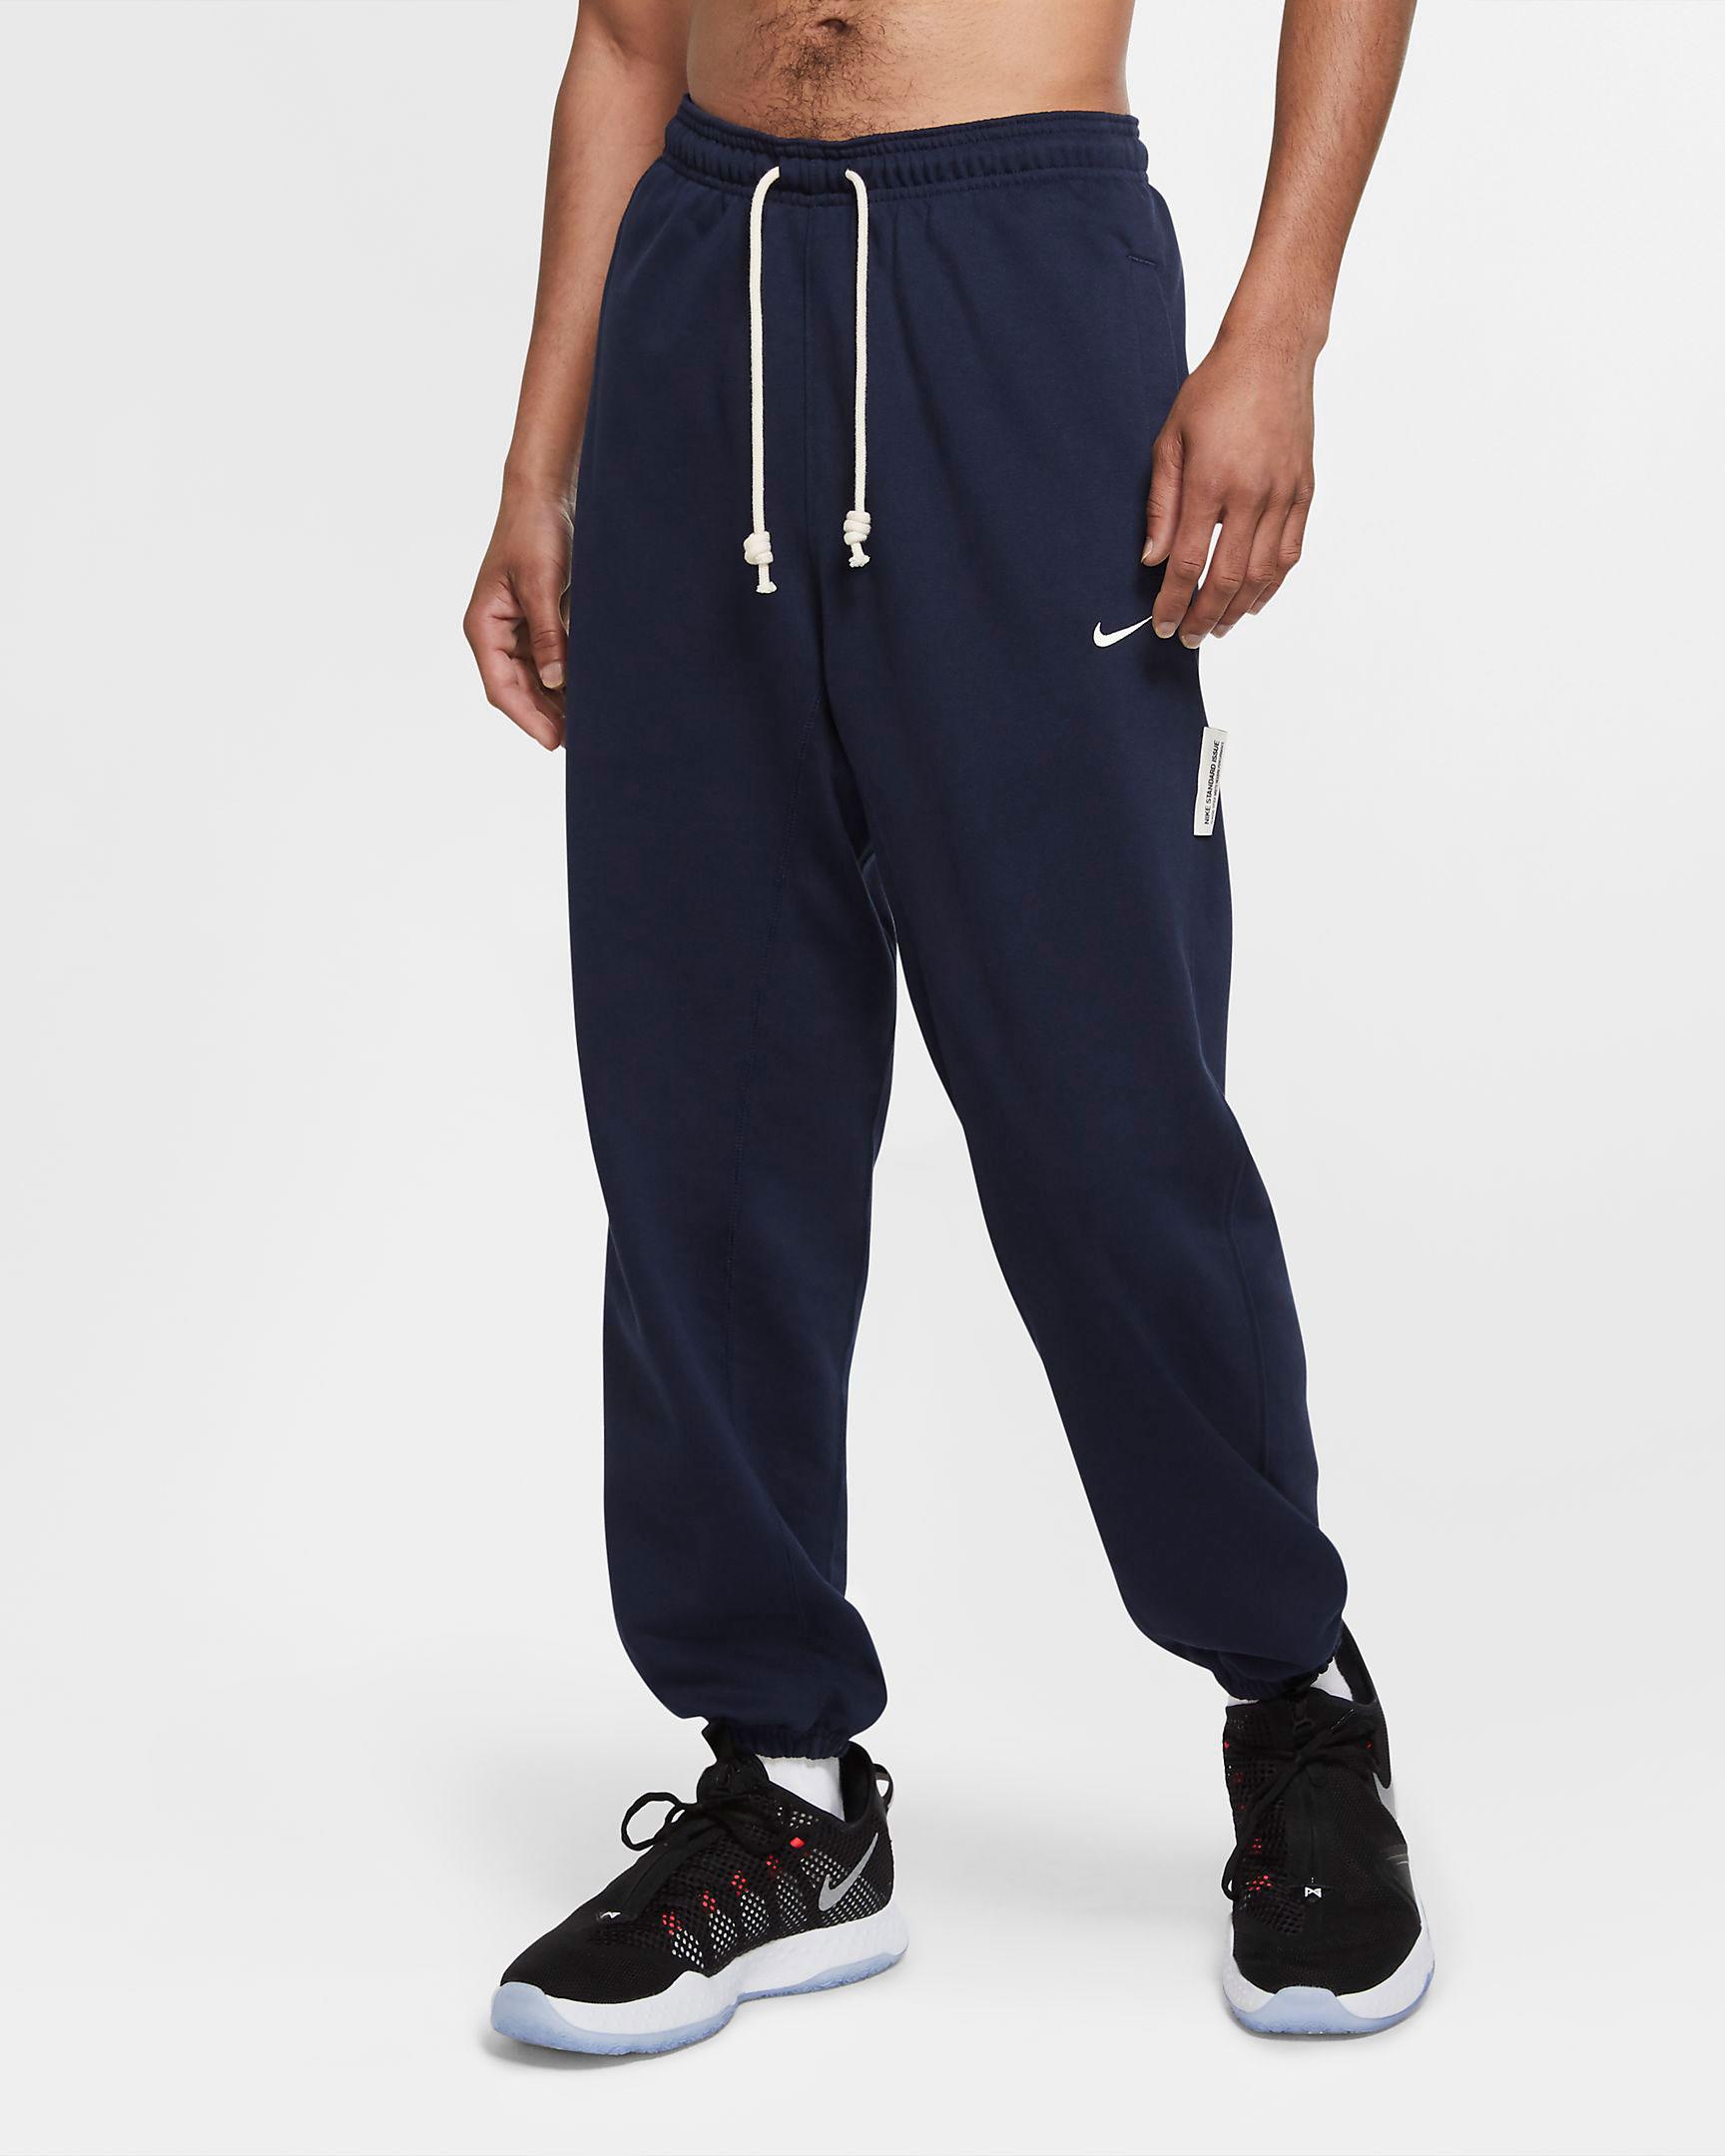 nike-lebron-17-graffiti-cold-blue-basketball-pants